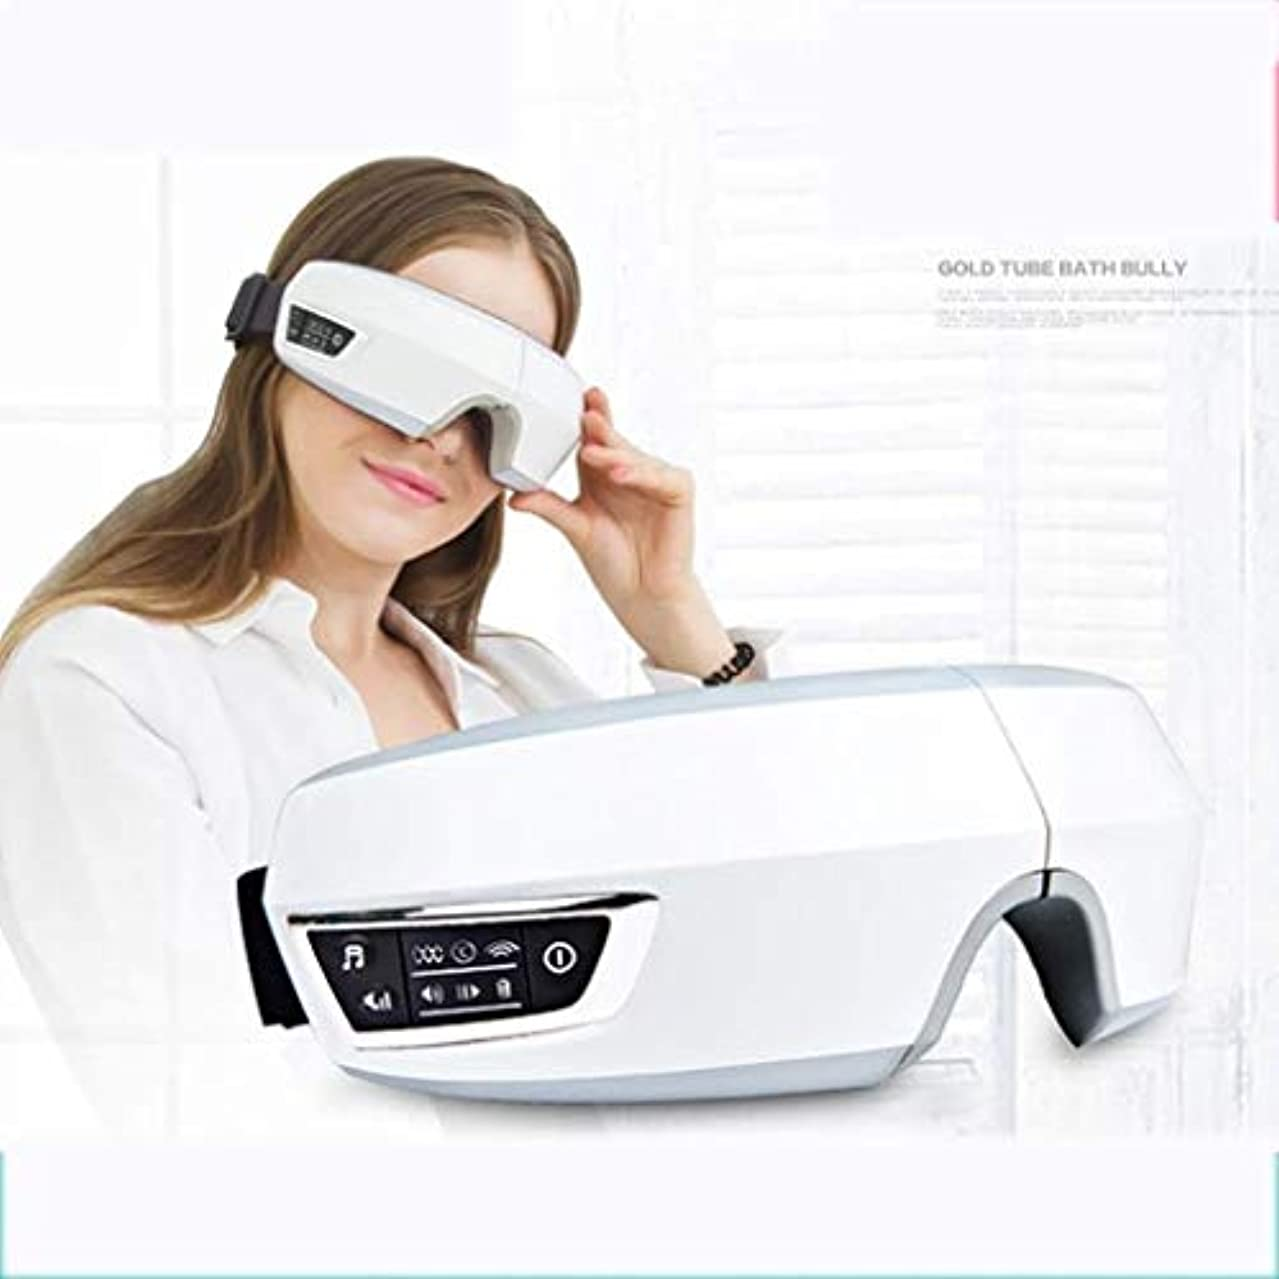 USB充電アイマッサージャー、アイケアアイマッサージ器具、ホットコンプレス、ダークアイビューティー器具の改善、視力保護アイピース、疲労軽減